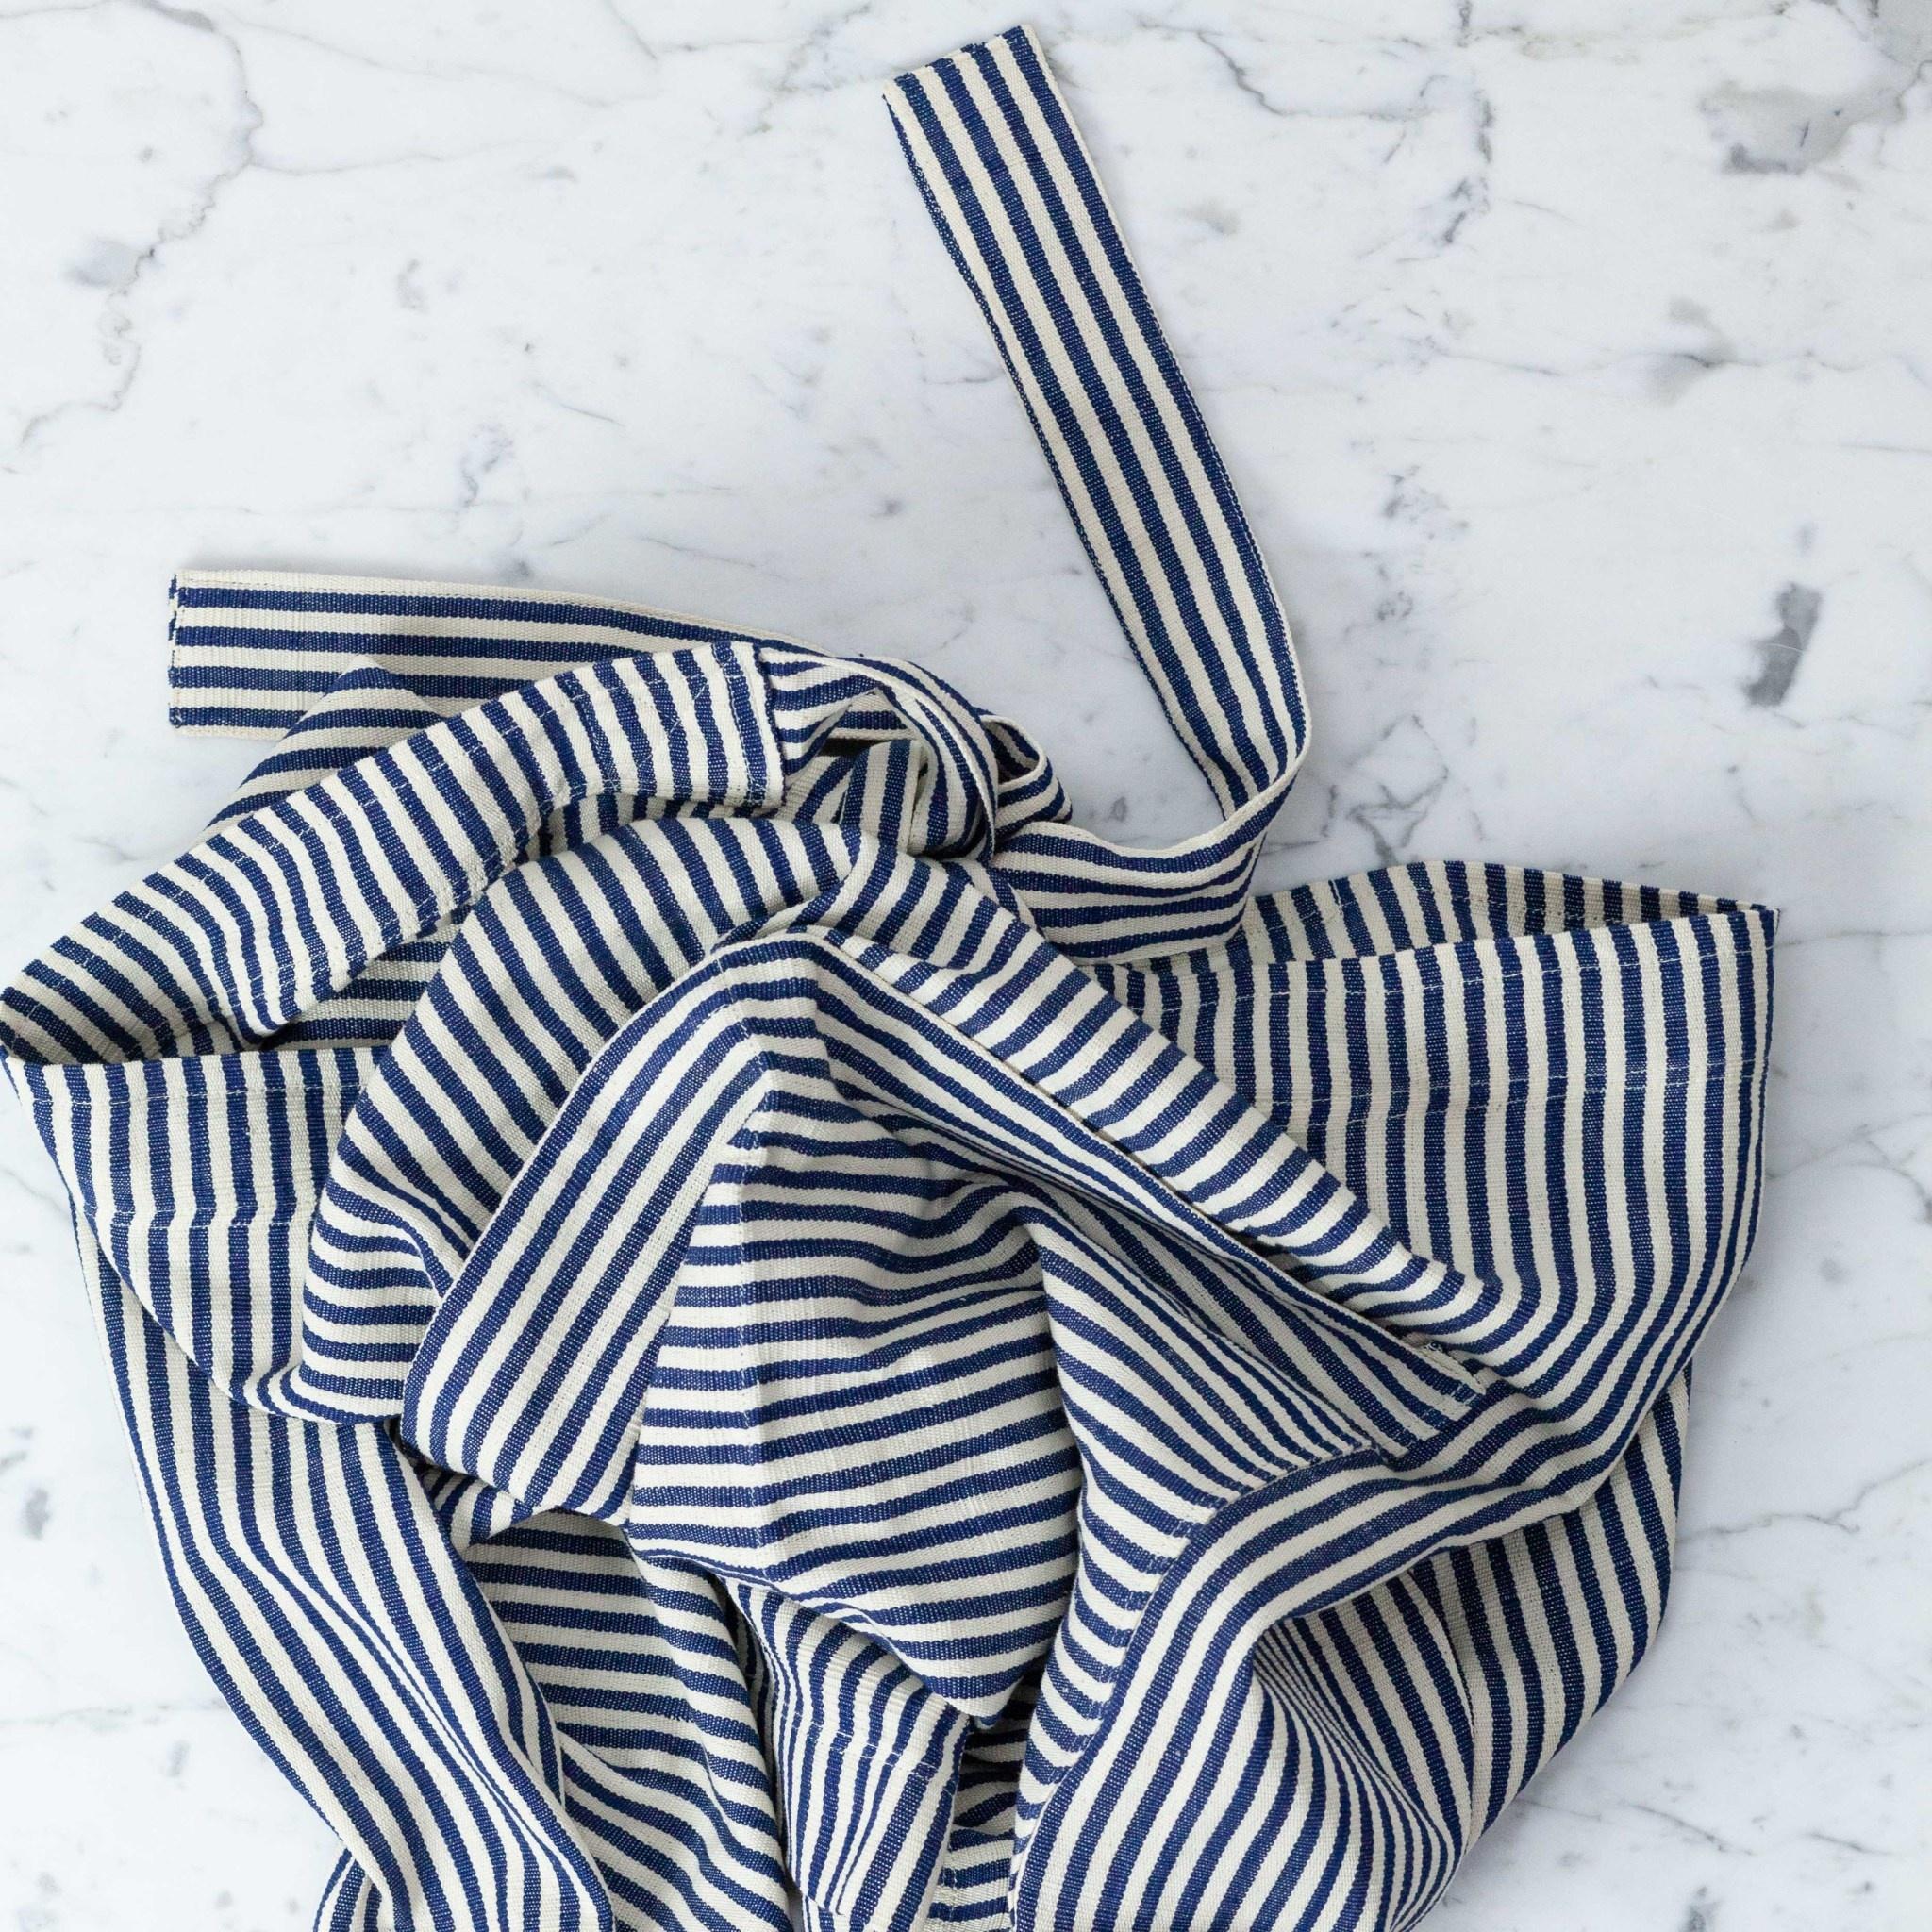 TENSIRA Handwoven Cotton Half Apron - Off White + Navy Blue Medium Stripe